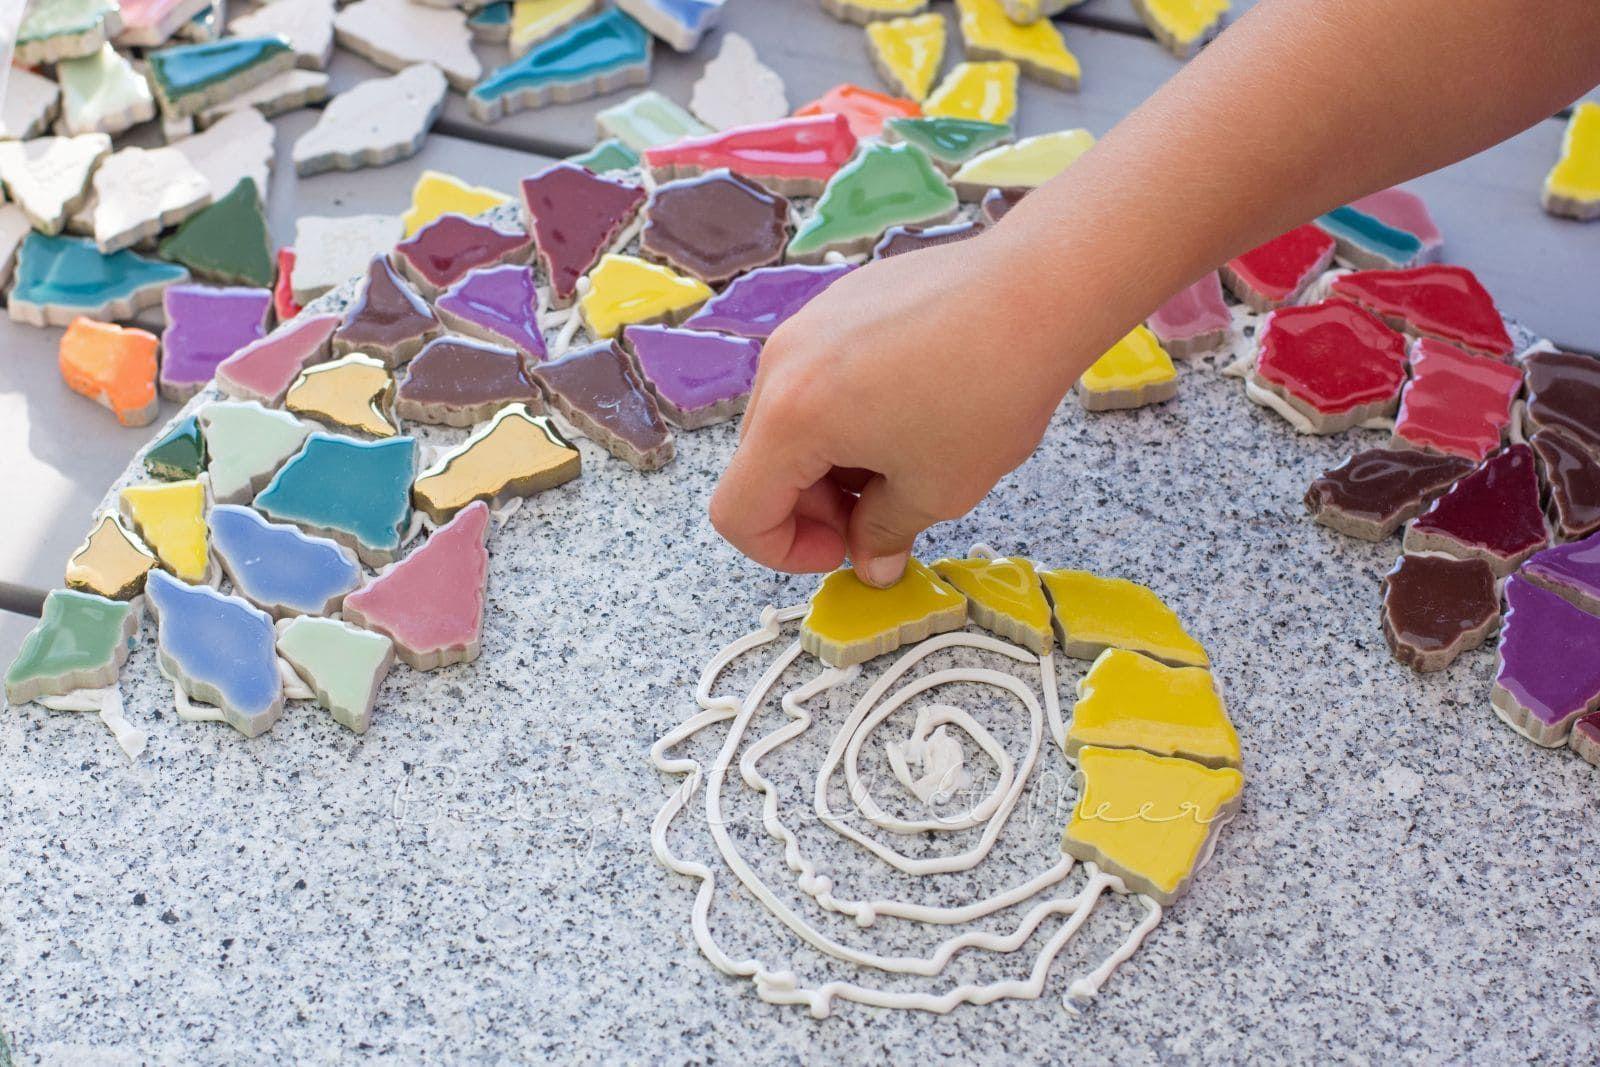 Datenschutz Stepping Stones In 2020 Gehwegplatten Mosaik Mosaik Selber Machen